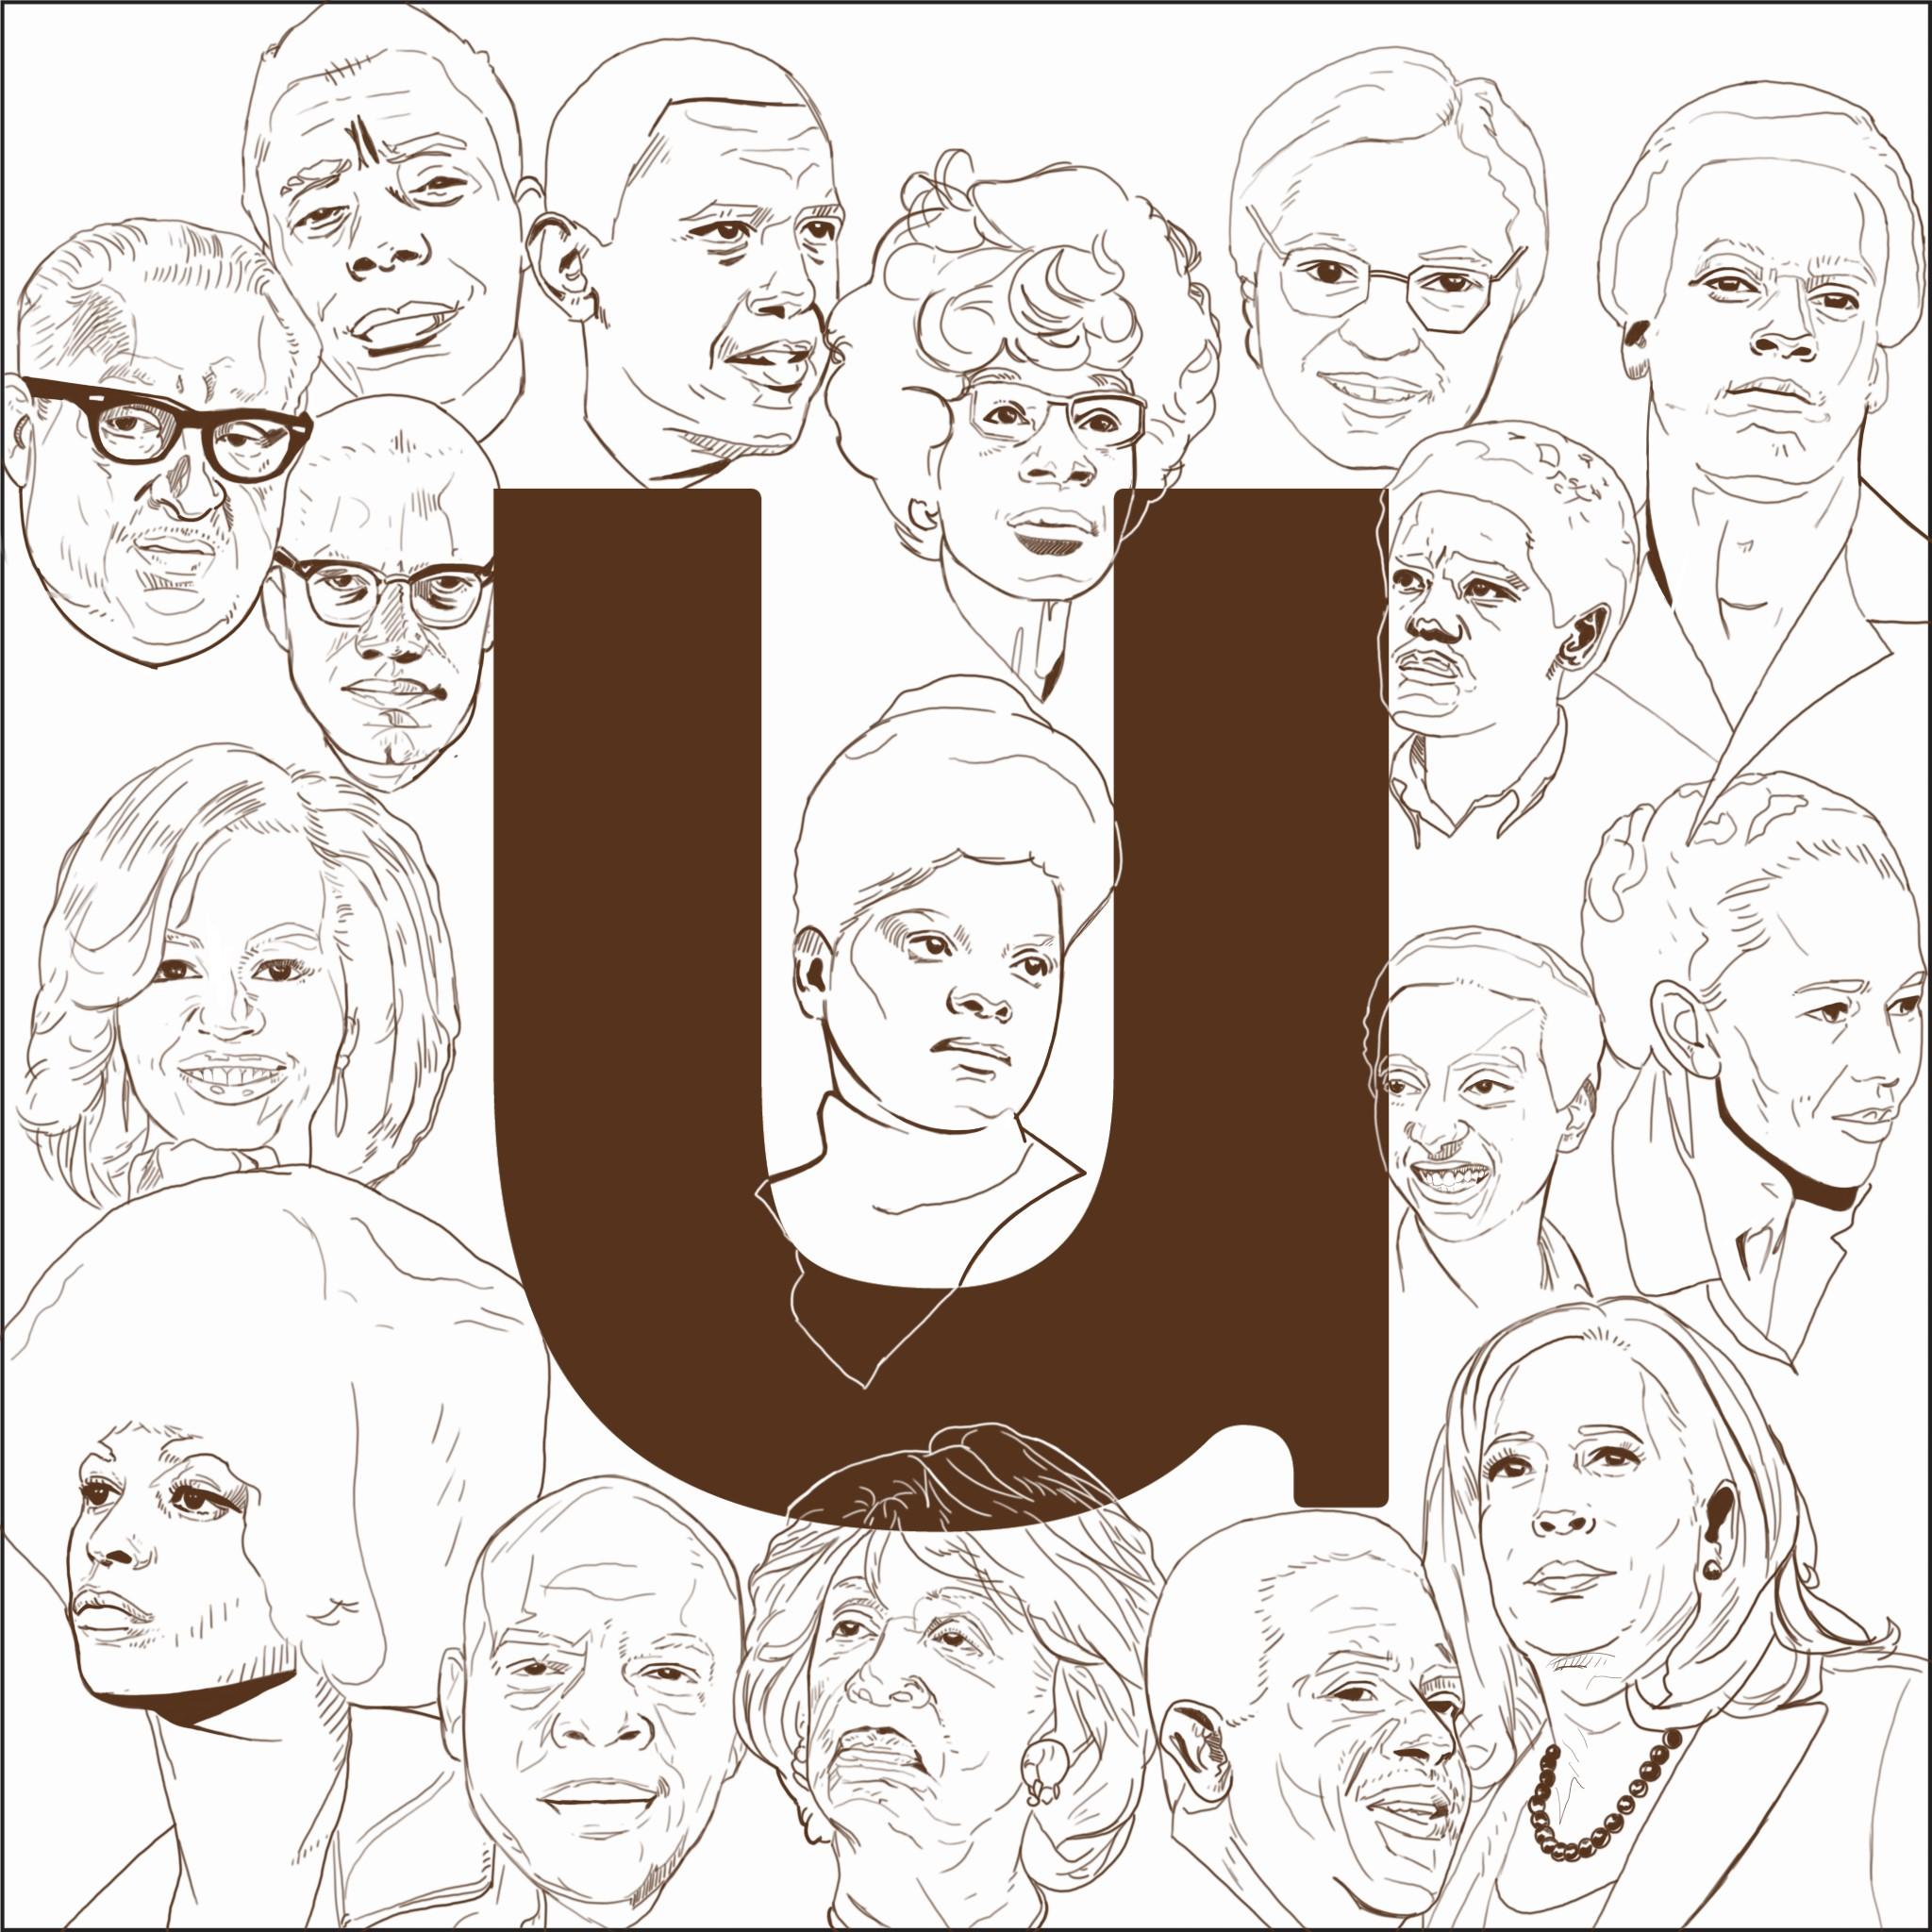 Utile Celebrates Black History Month with logo designed by Mykael Tucker